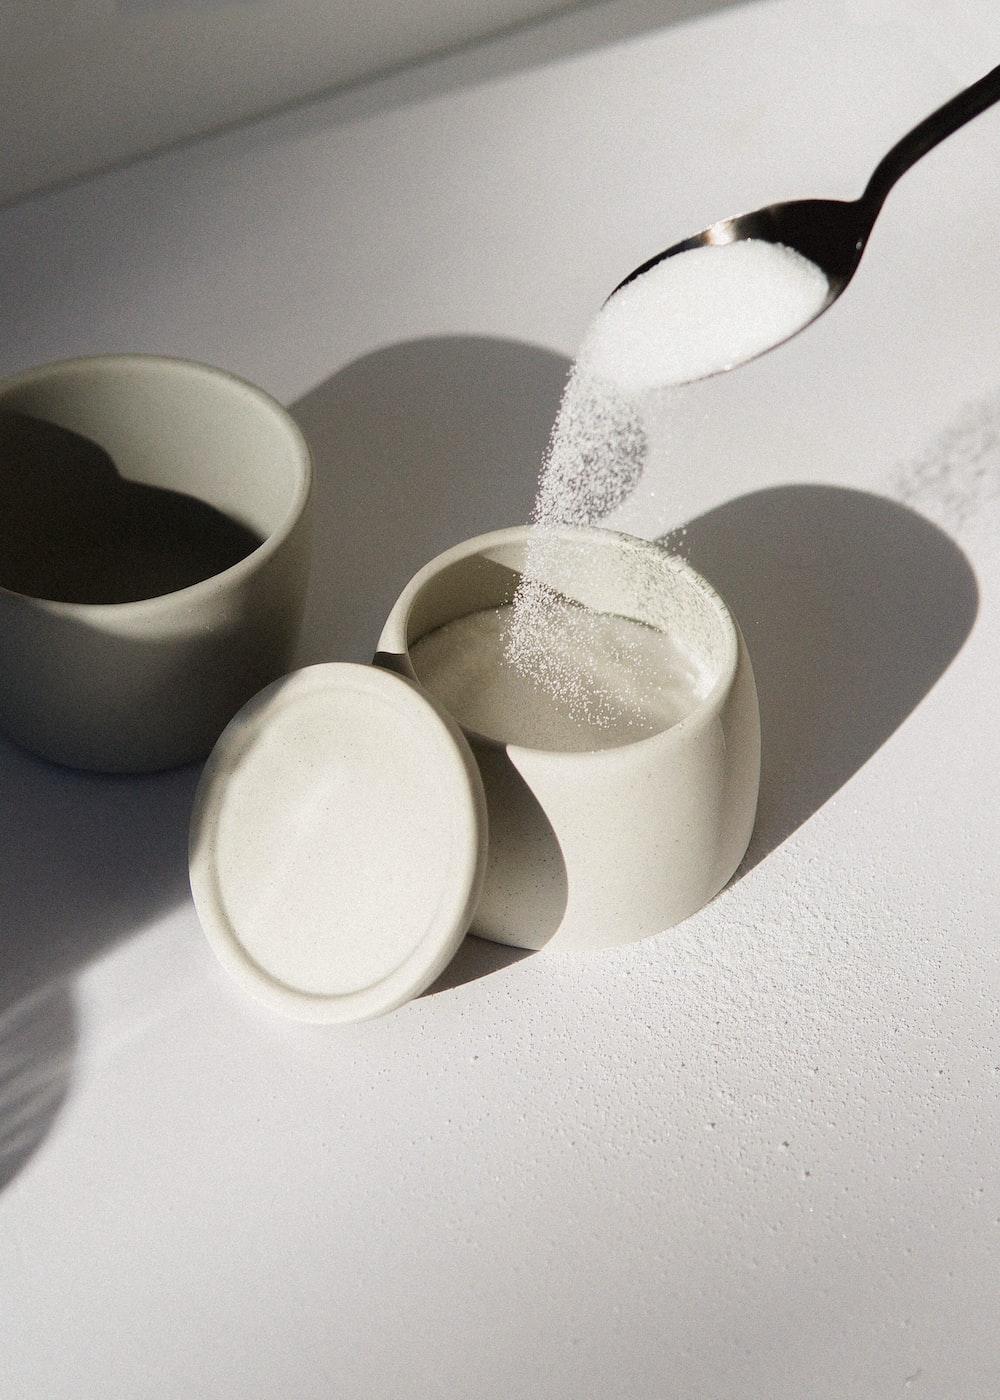 white ceramic mugs on white table